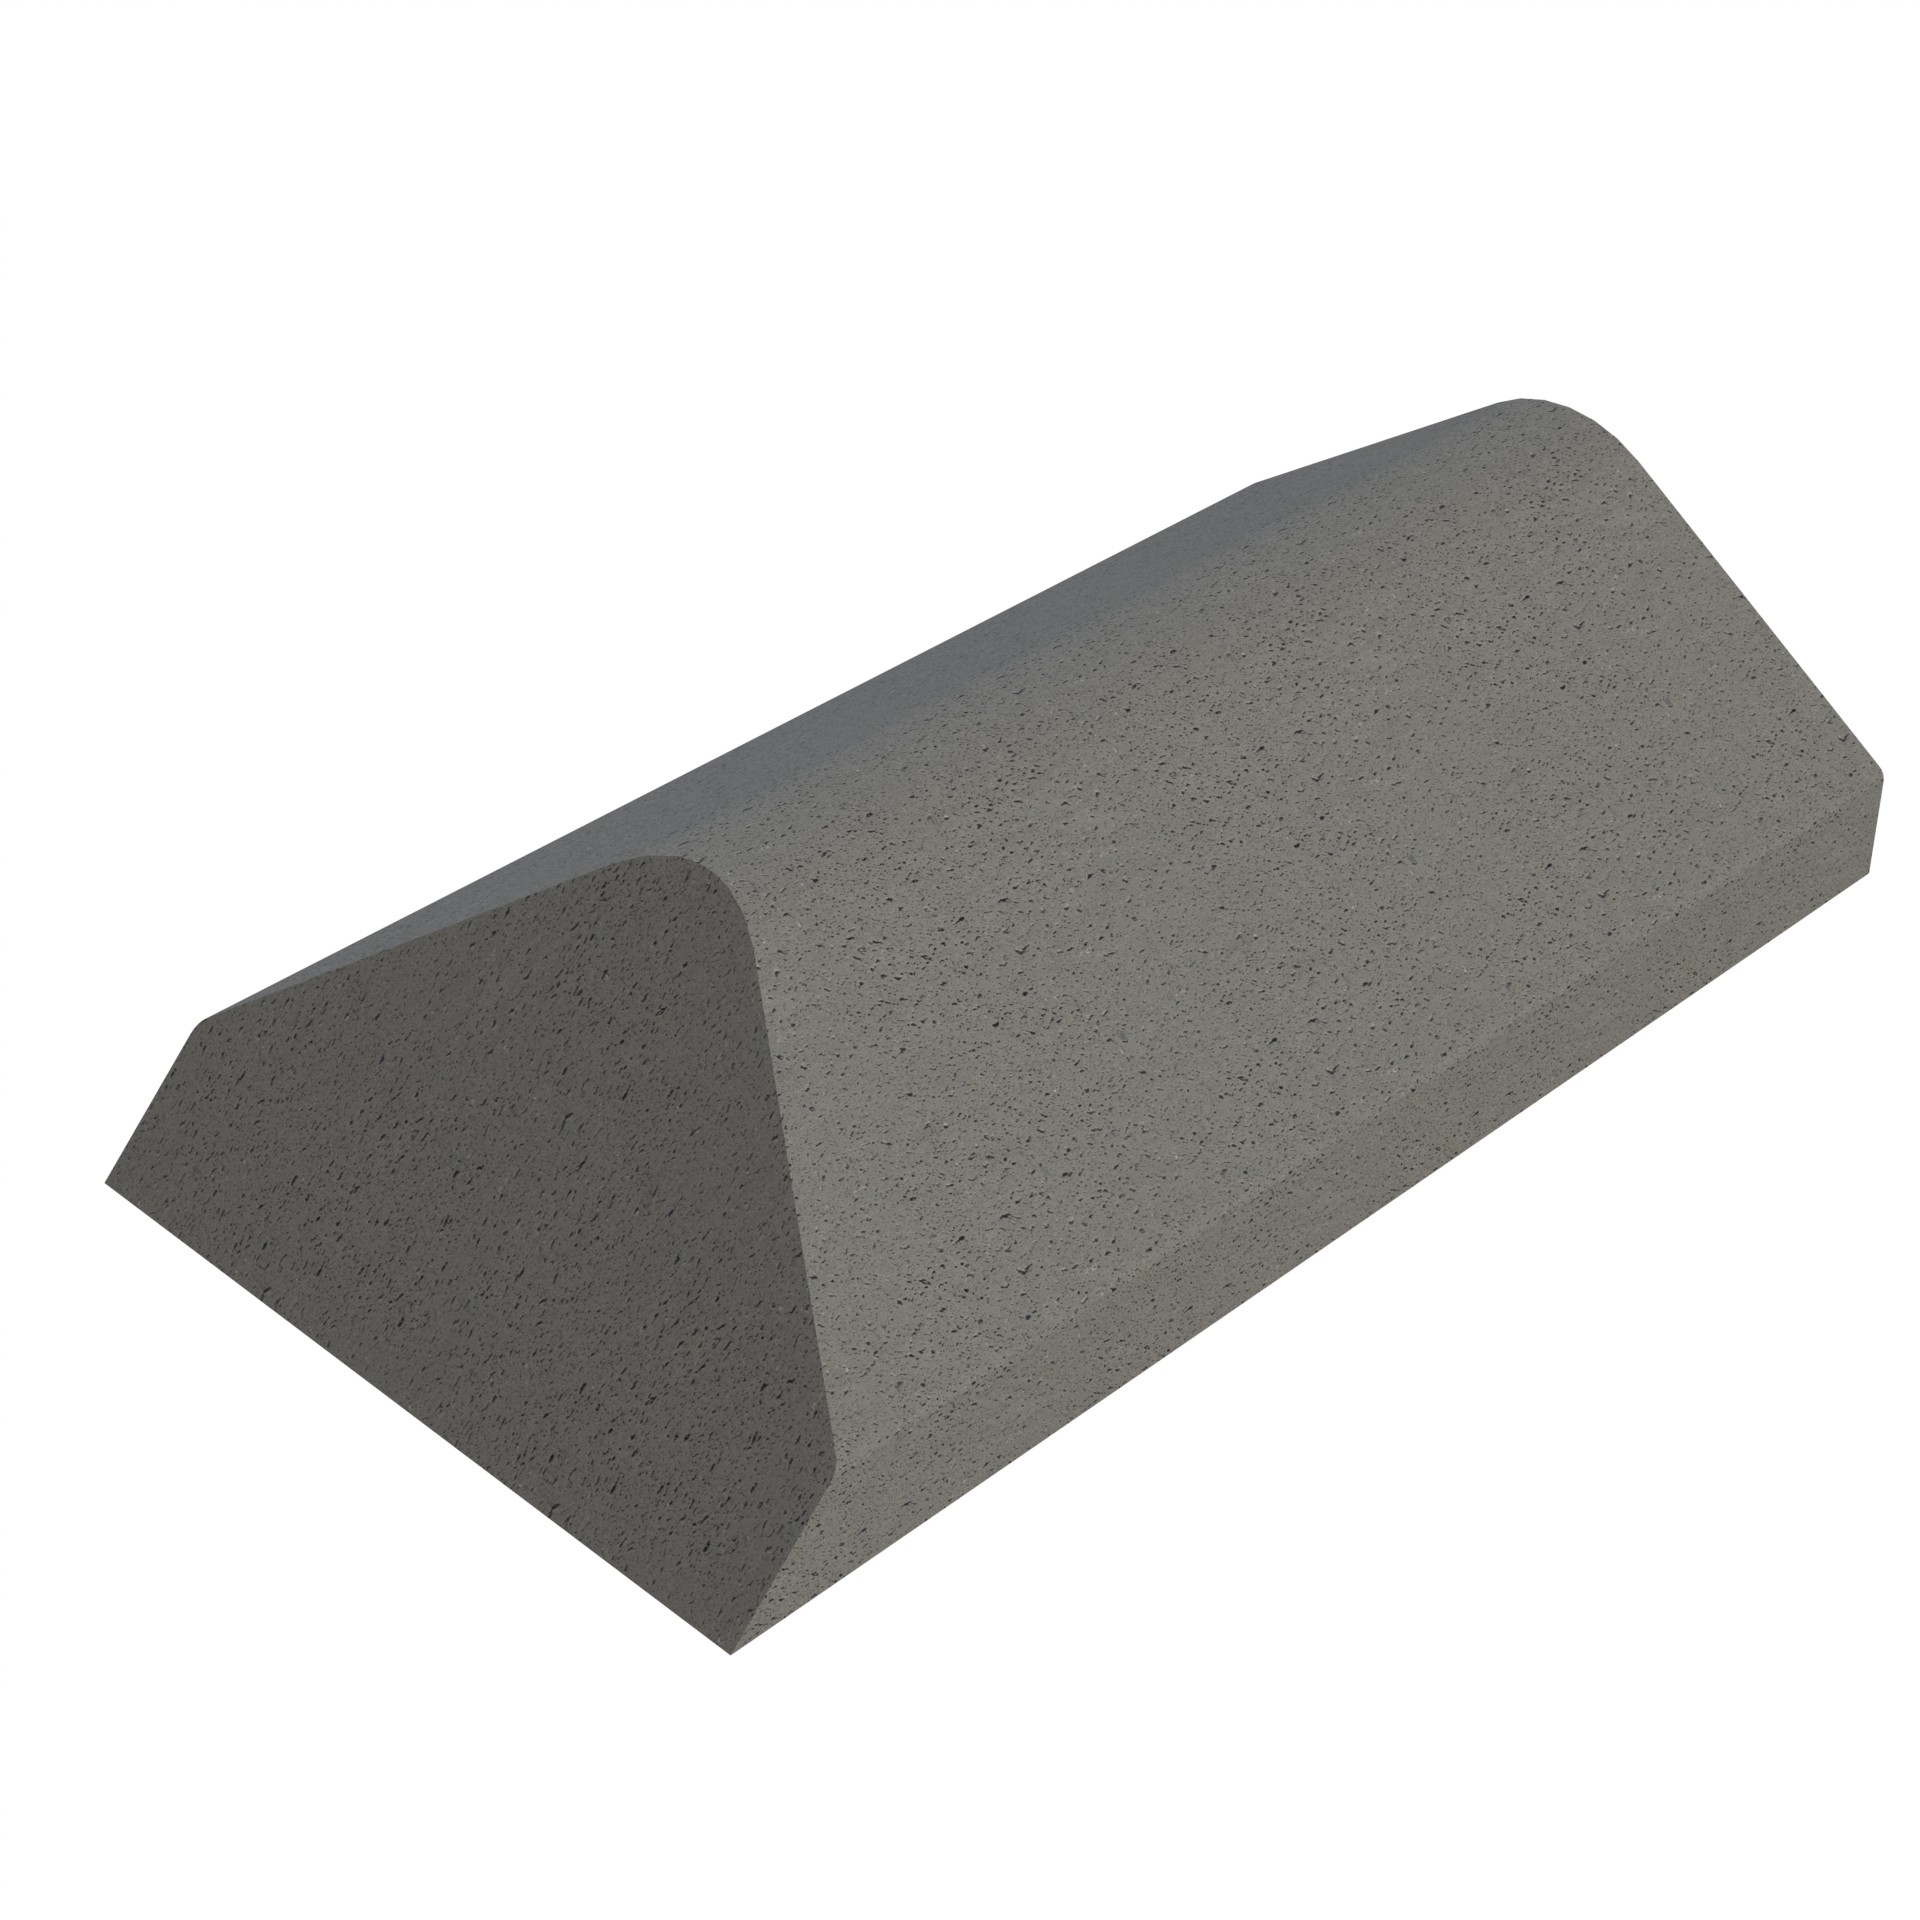 SANDTOFT TILES - Concrete Legged Angle Ridge With Hip End